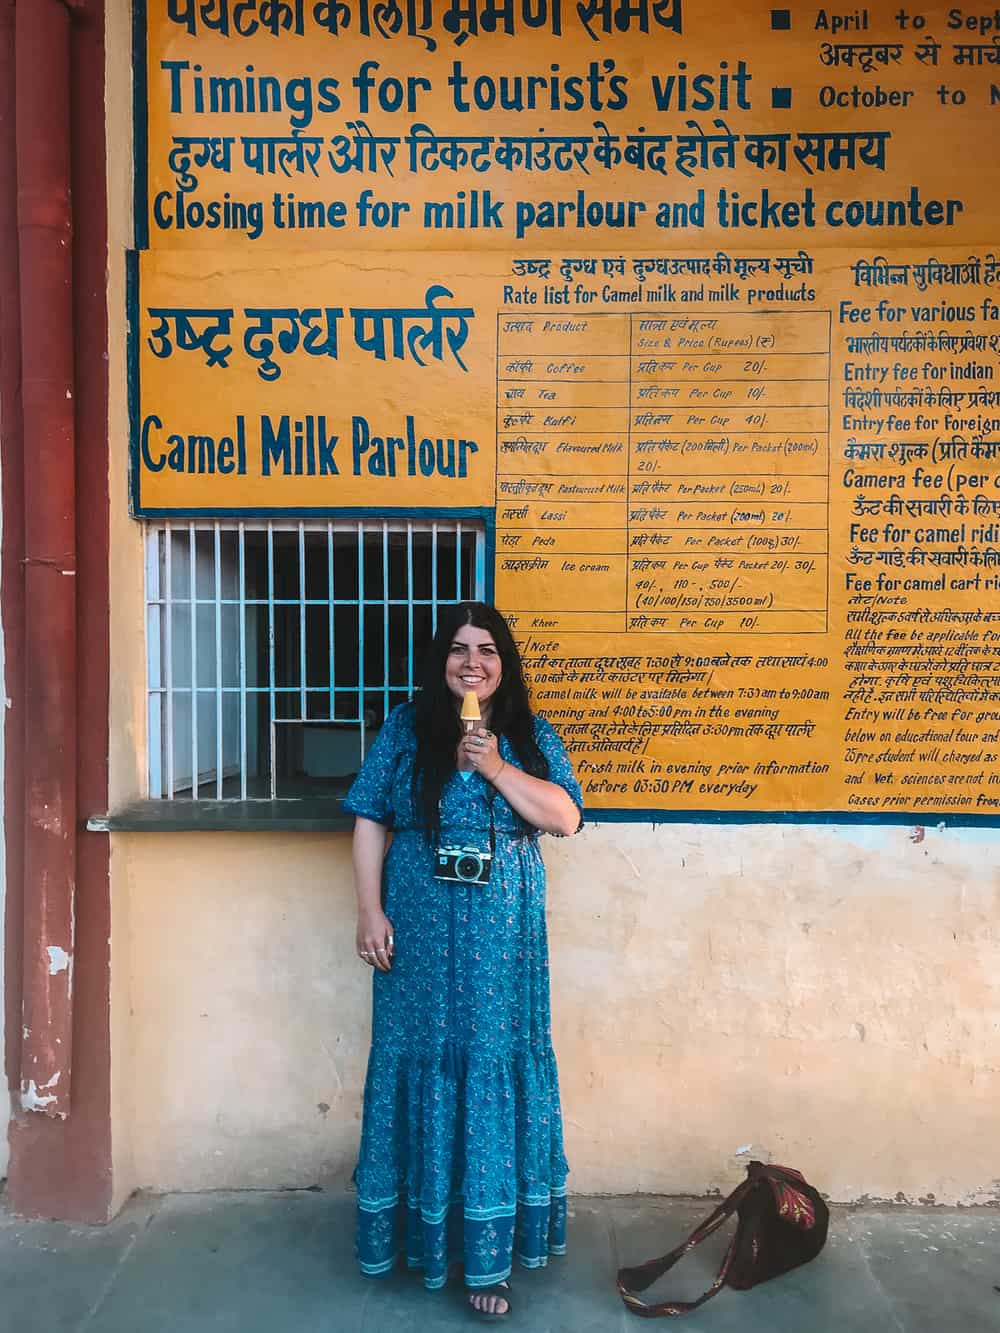 Camel Milk Kulfi | Bikaner Camel Research Centre | Places to visit in Bikaner